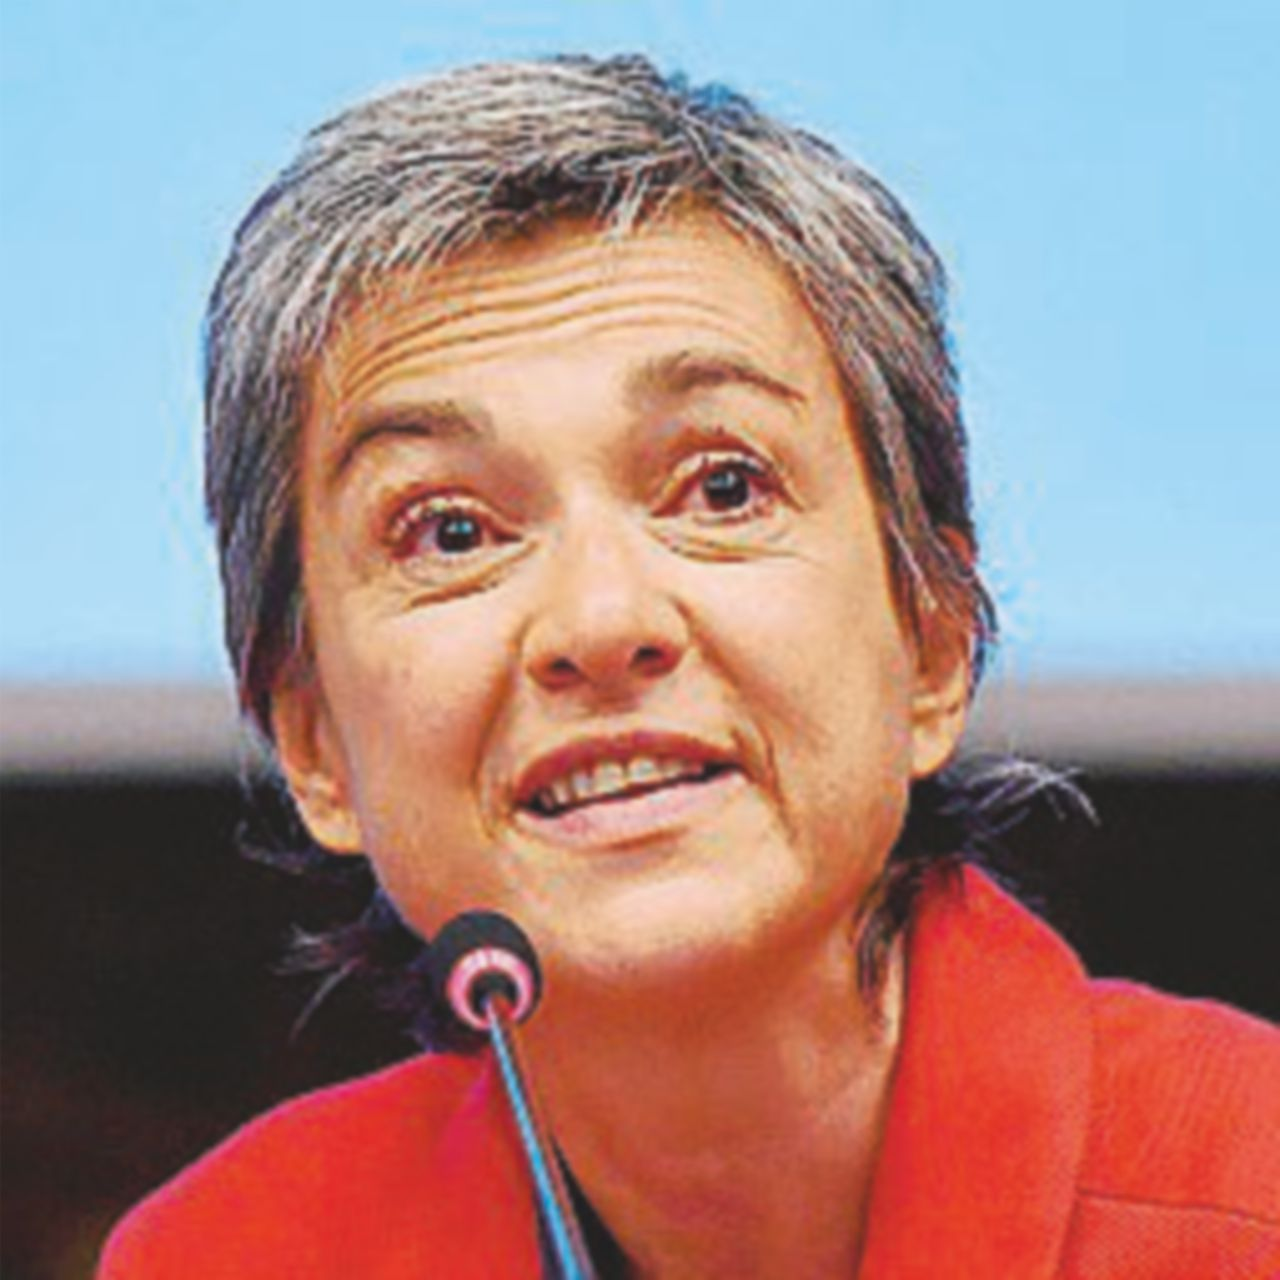 La fabbrica di flop di Daria Bignardi: Rai3 in estinzione